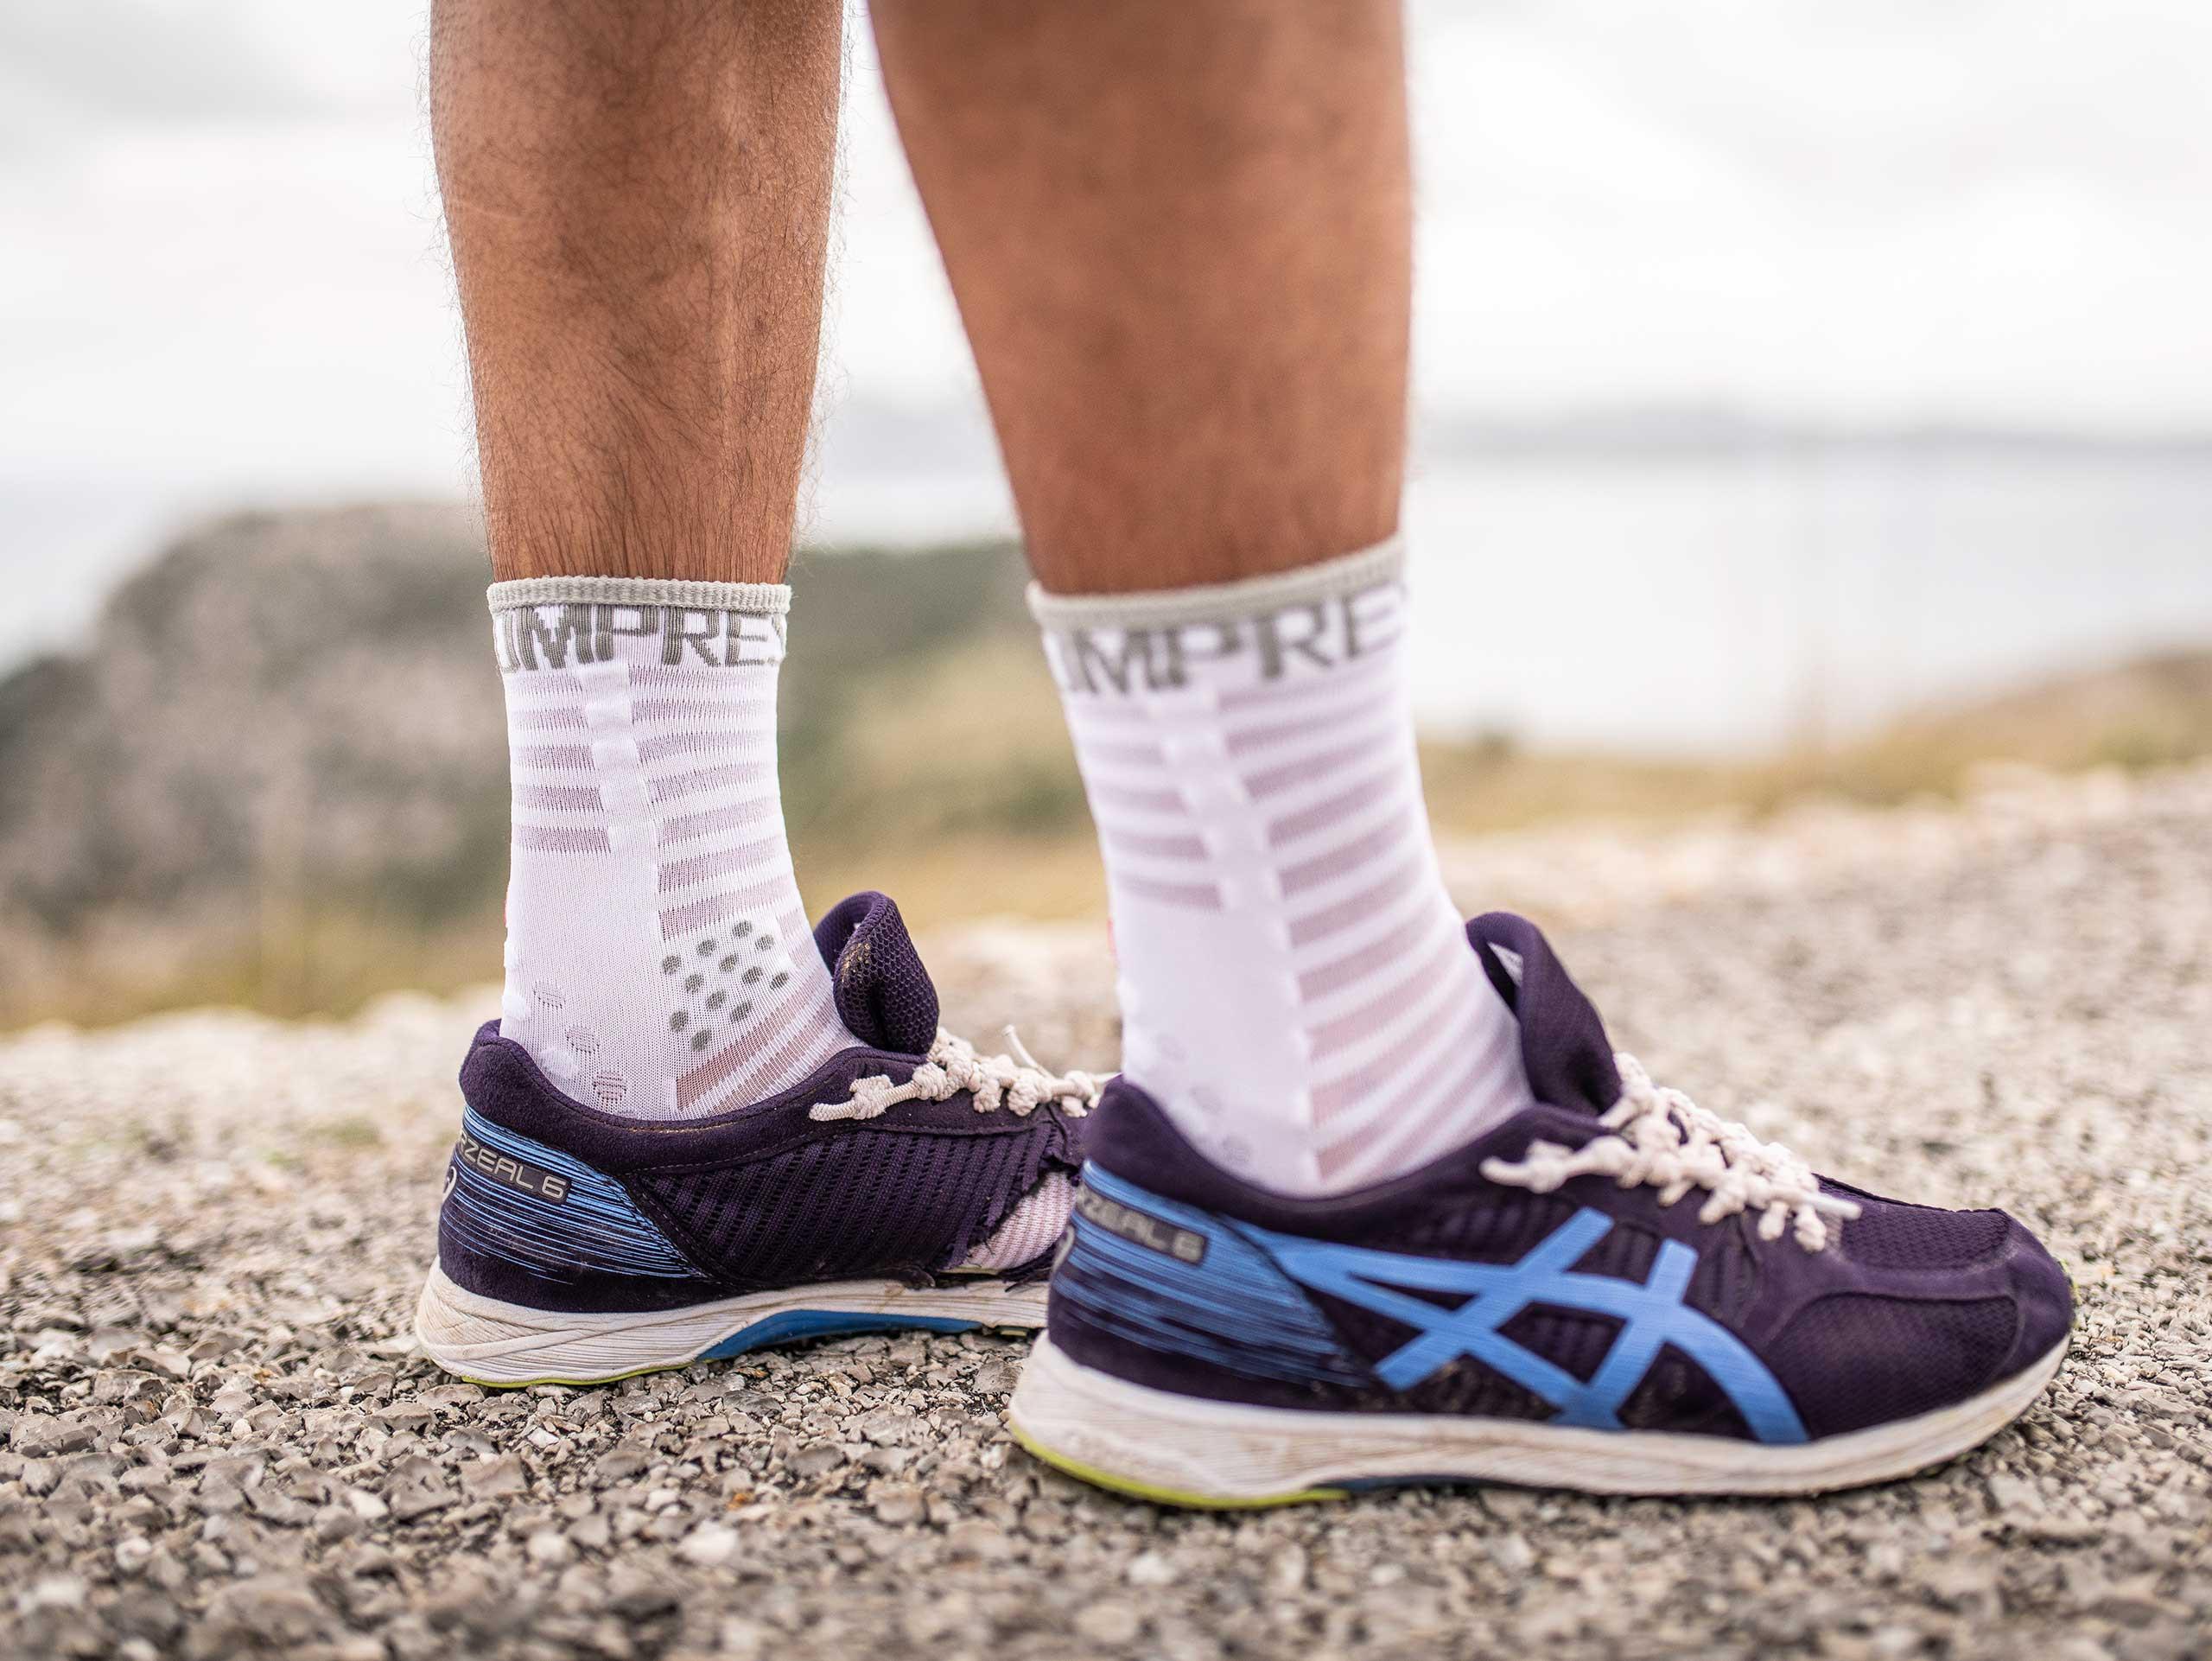 Pro Racing Socks v3.0 Ultralight Run High blanc